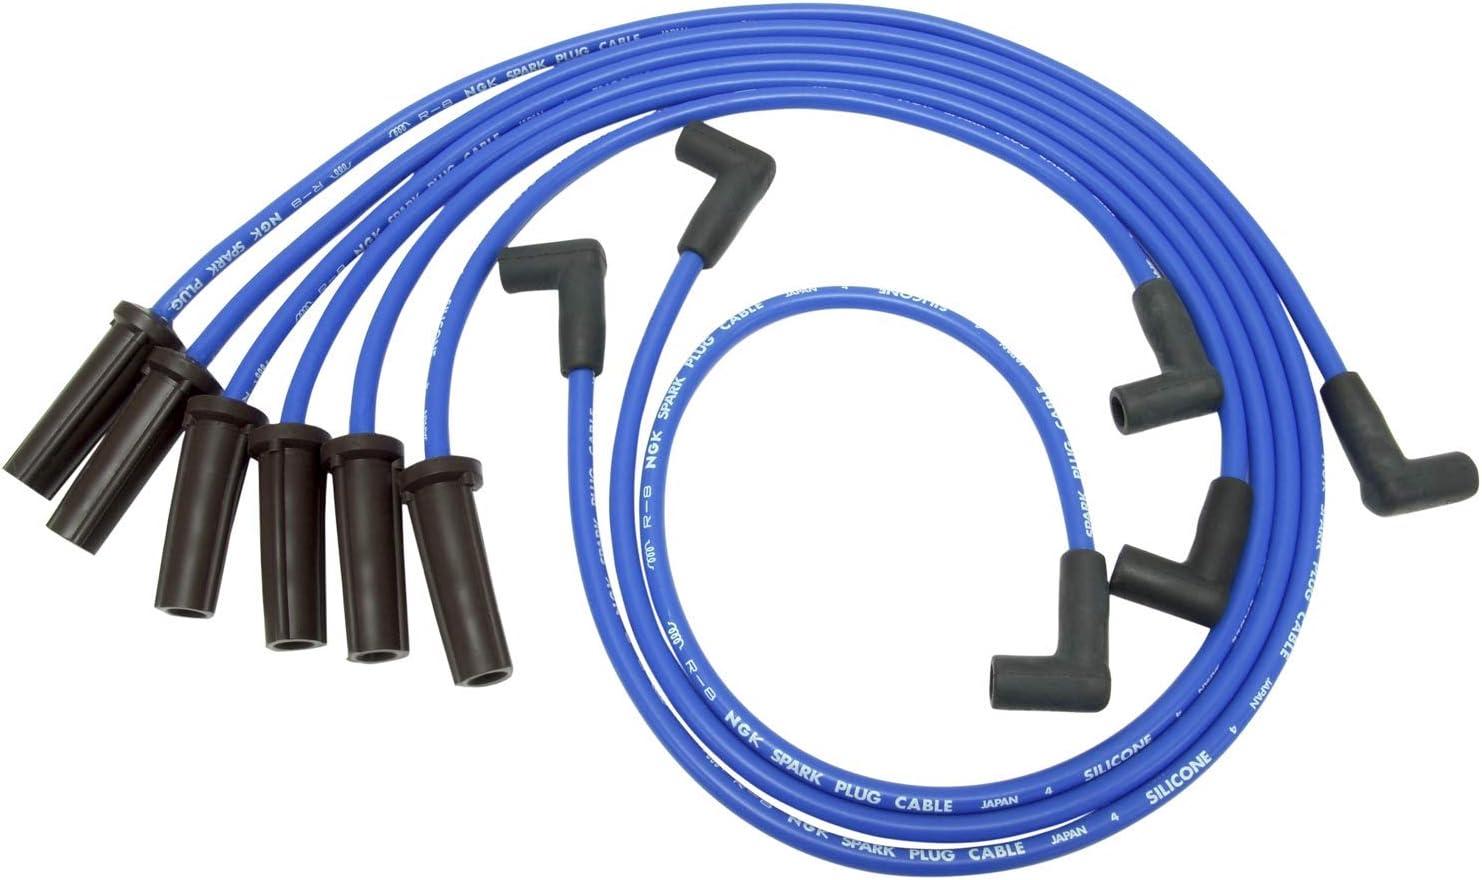 High material NGK 51135 RC-GMZ046 Spark [Alternative dealer] Set Plug Wire